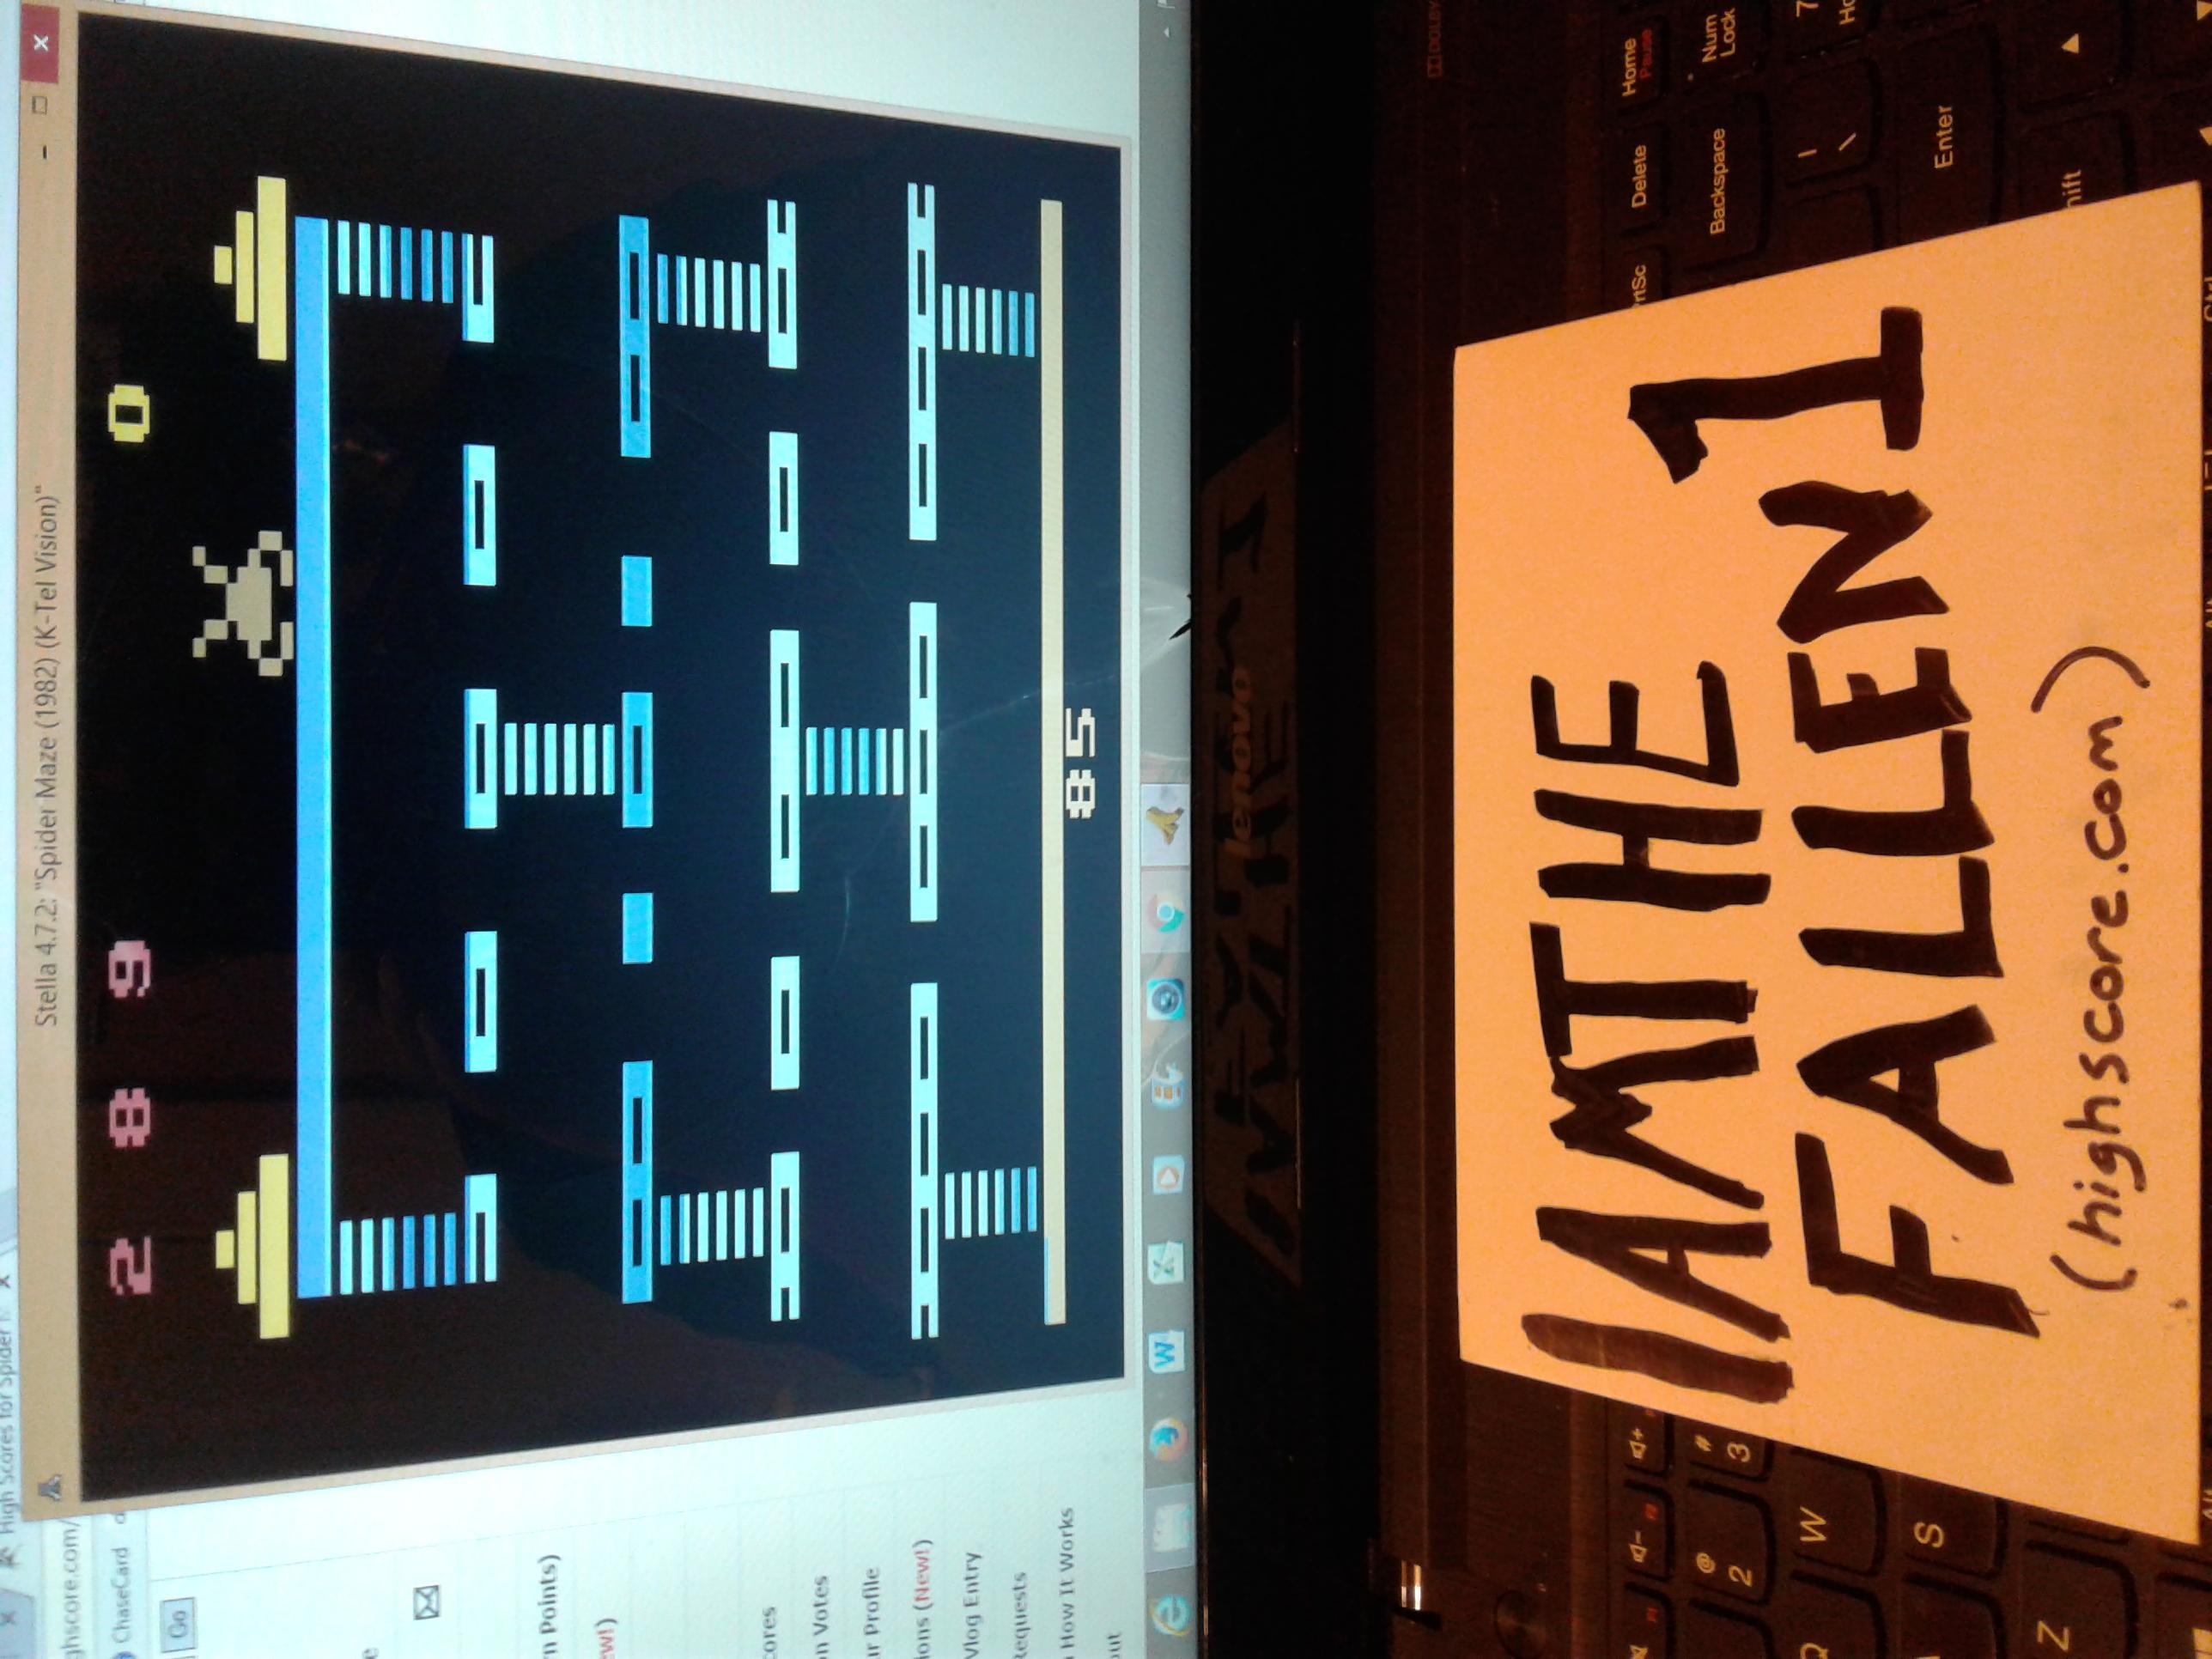 iamthefallen1: Spider Maze / Inca Gold / Spider Kong / Spider Monster (Atari 2600 Emulated) 289 points on 2017-05-04 20:14:24